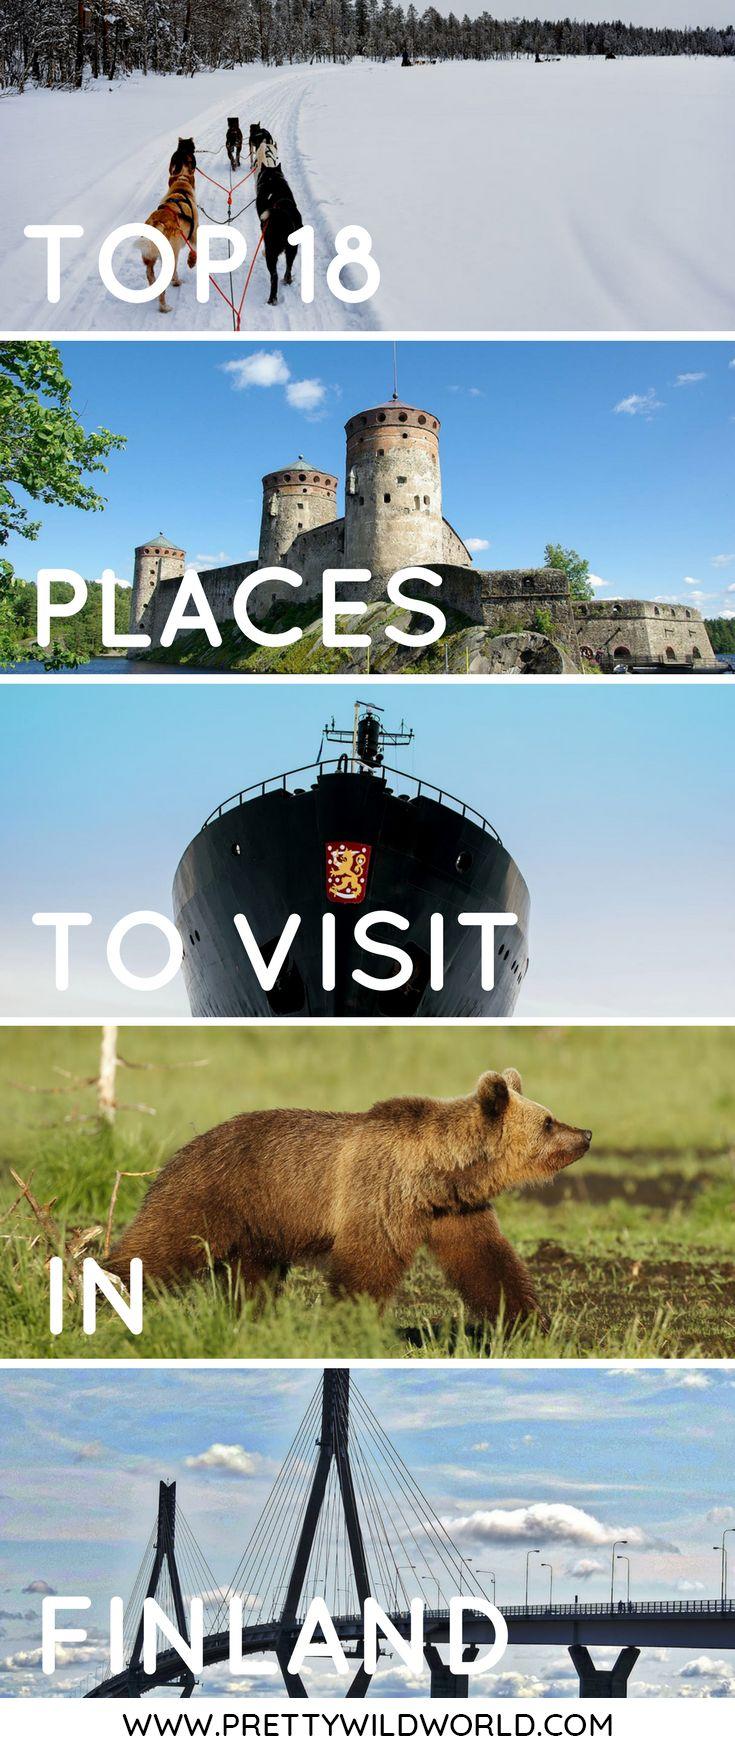 #FINLAND #EUROPE #TRAVEL | Places to visit in Finland | Heksinki | Tampere | Espoo | Vaasa | Jyväskylä | Rovaniemi | Joensuu | Kuhmo | Salla | Savonlinna | Kajaani | Porvoo | Turku | Pori | Finland travel guide | Trip to Finland | Travel to Finland | Visit Finland | Best time to visit Finland | How to travel to Finland | Where to stay in Finland | How to get around Finland | Finland points of interests | Things to do in Finland | Best tours in Finland | What to do in Finland